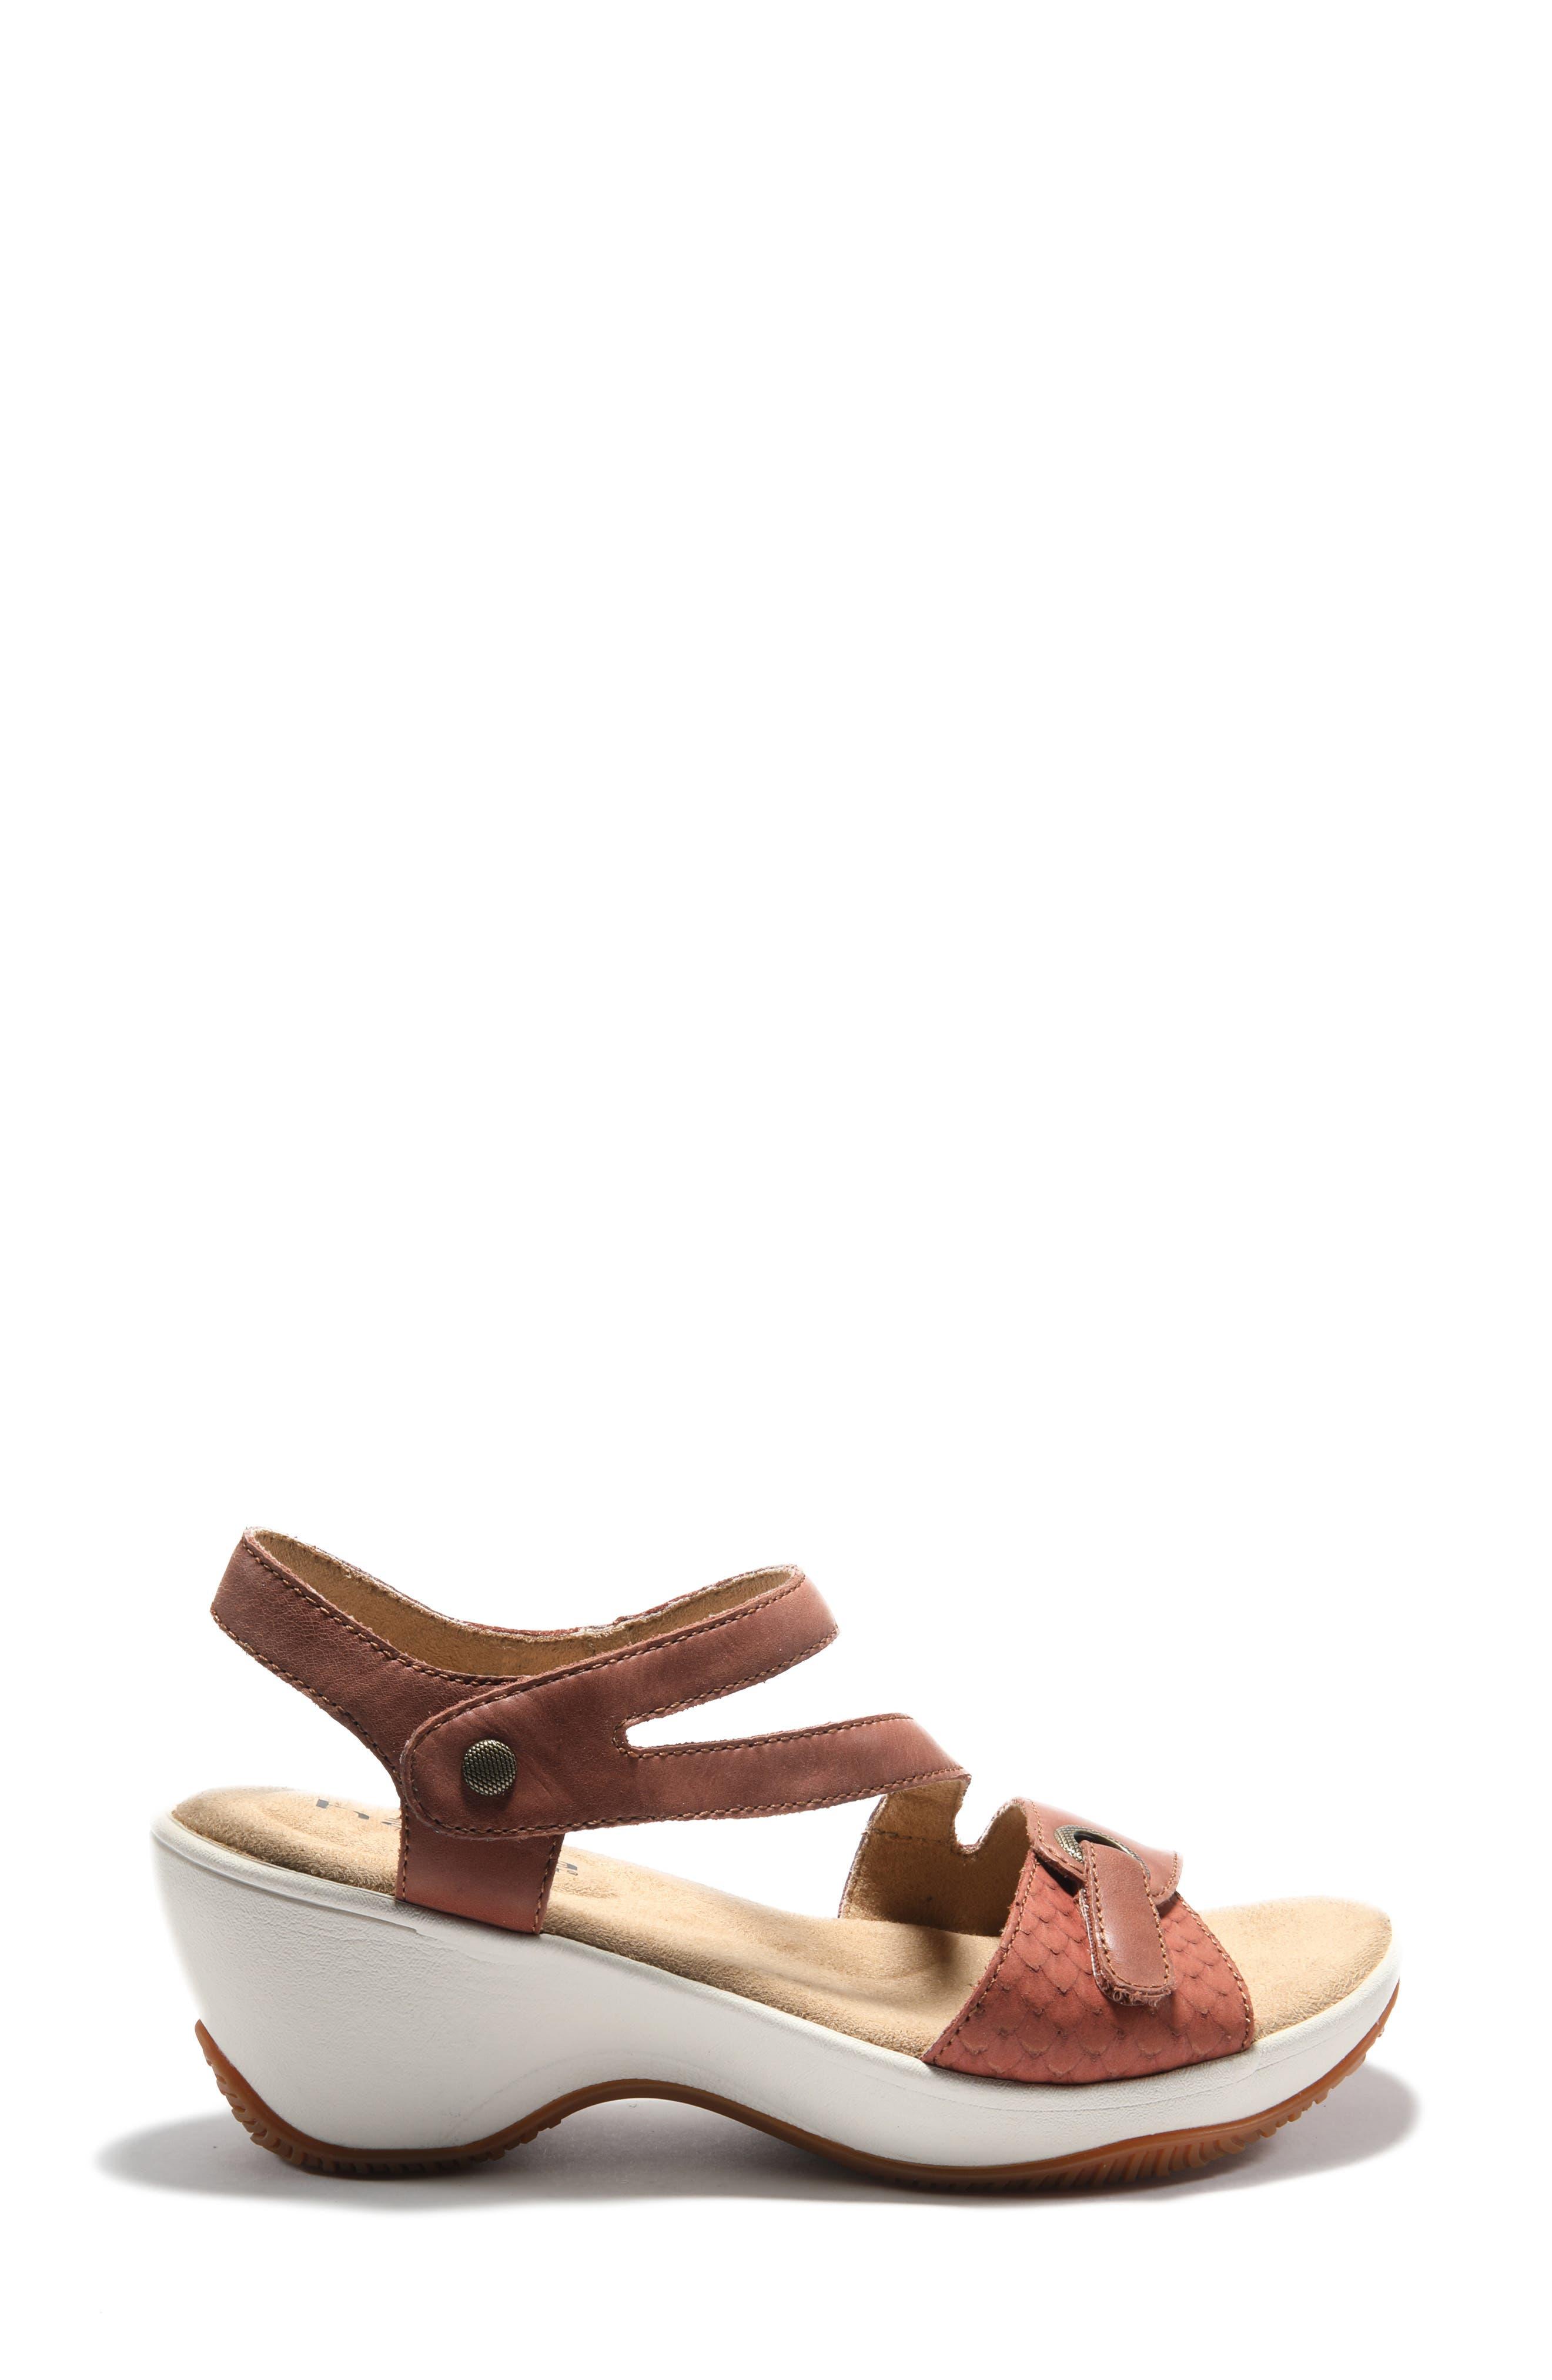 Women's Halsa Clara Asymmetrical Sandal